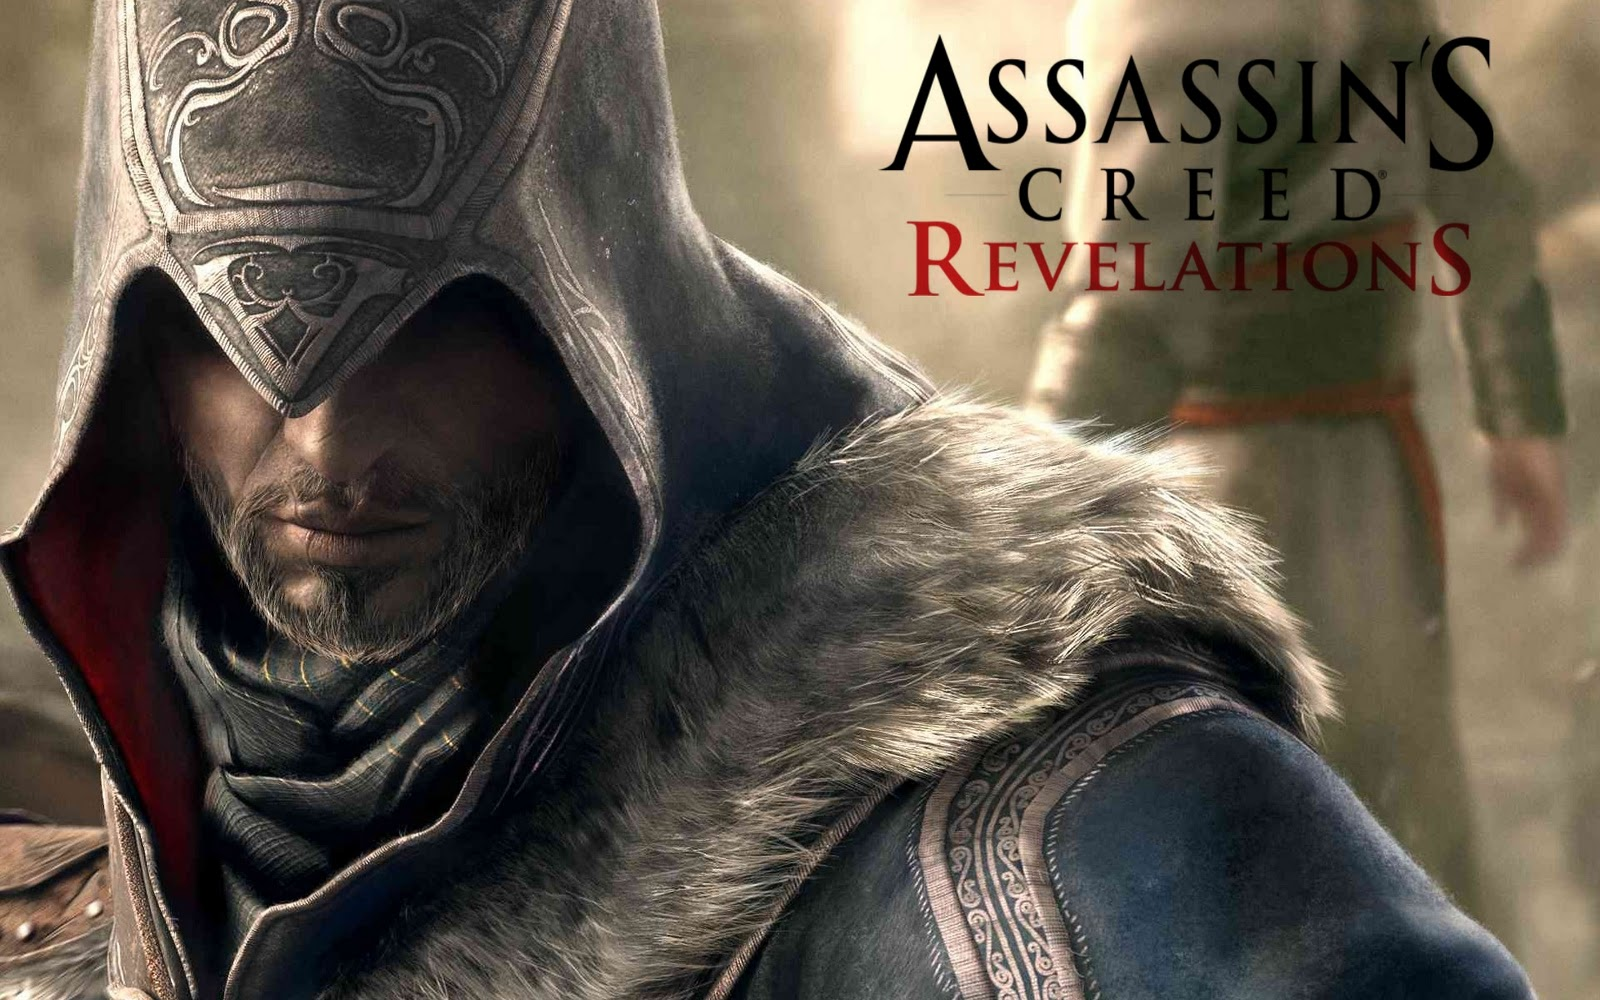 Just Walls Assassins Creed Revelations Game Wallpaper 1600x1000